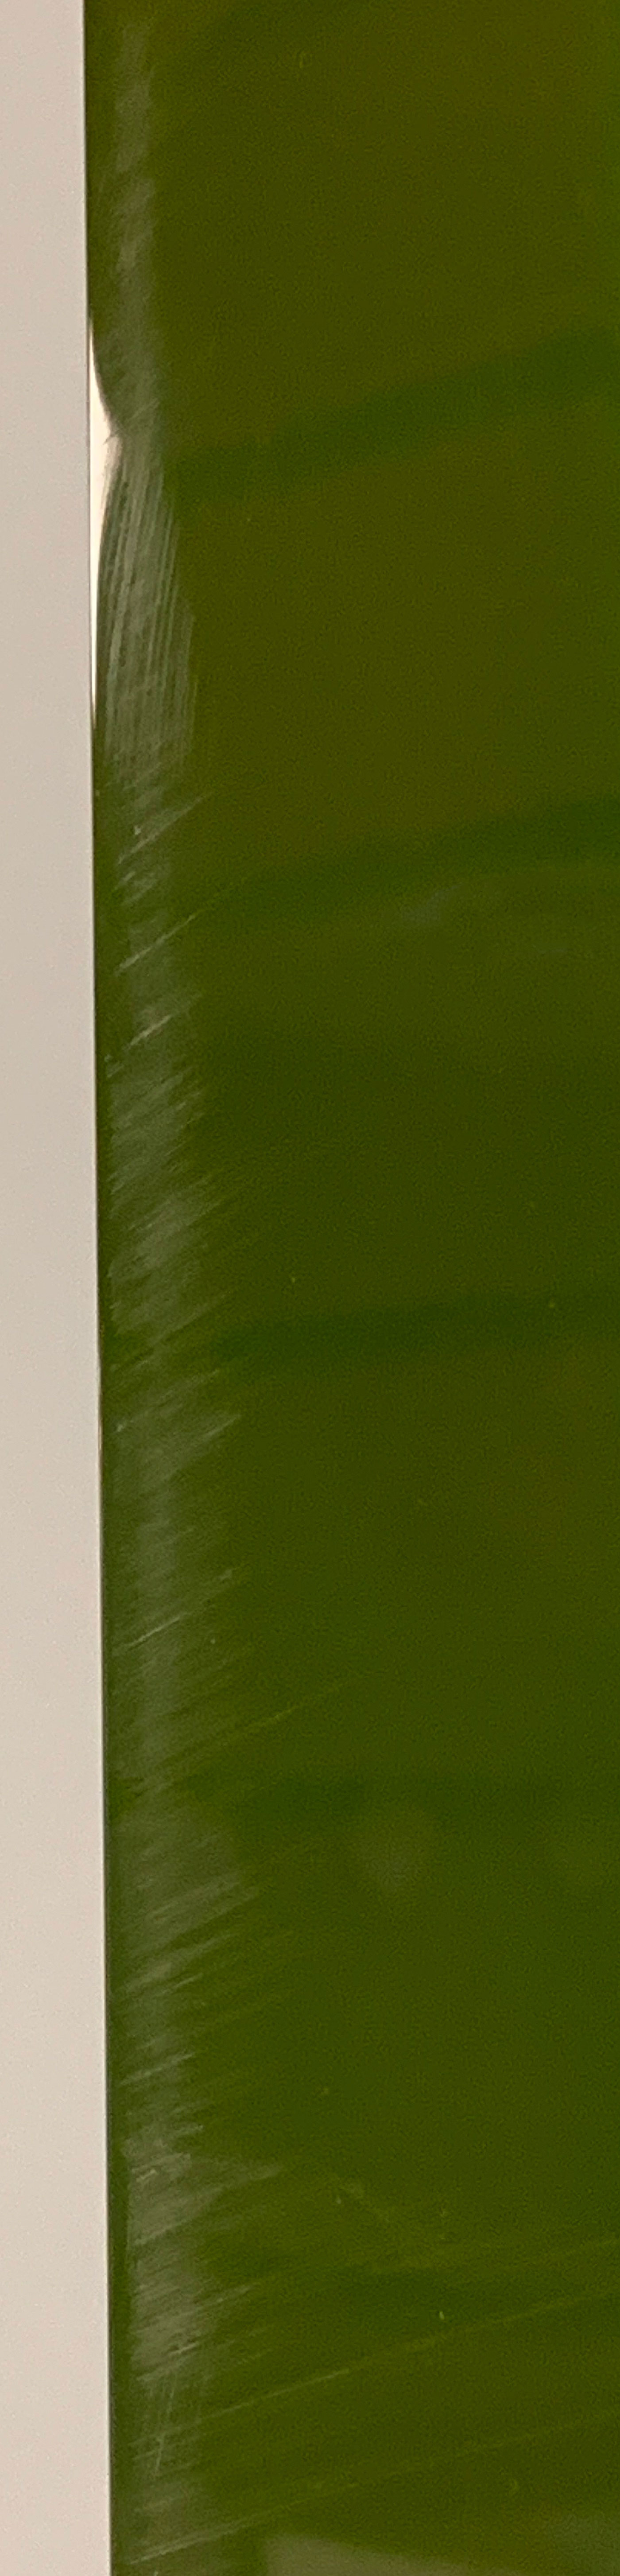 LARGE VASA MIHICH COLUMN - Image 7 of 7